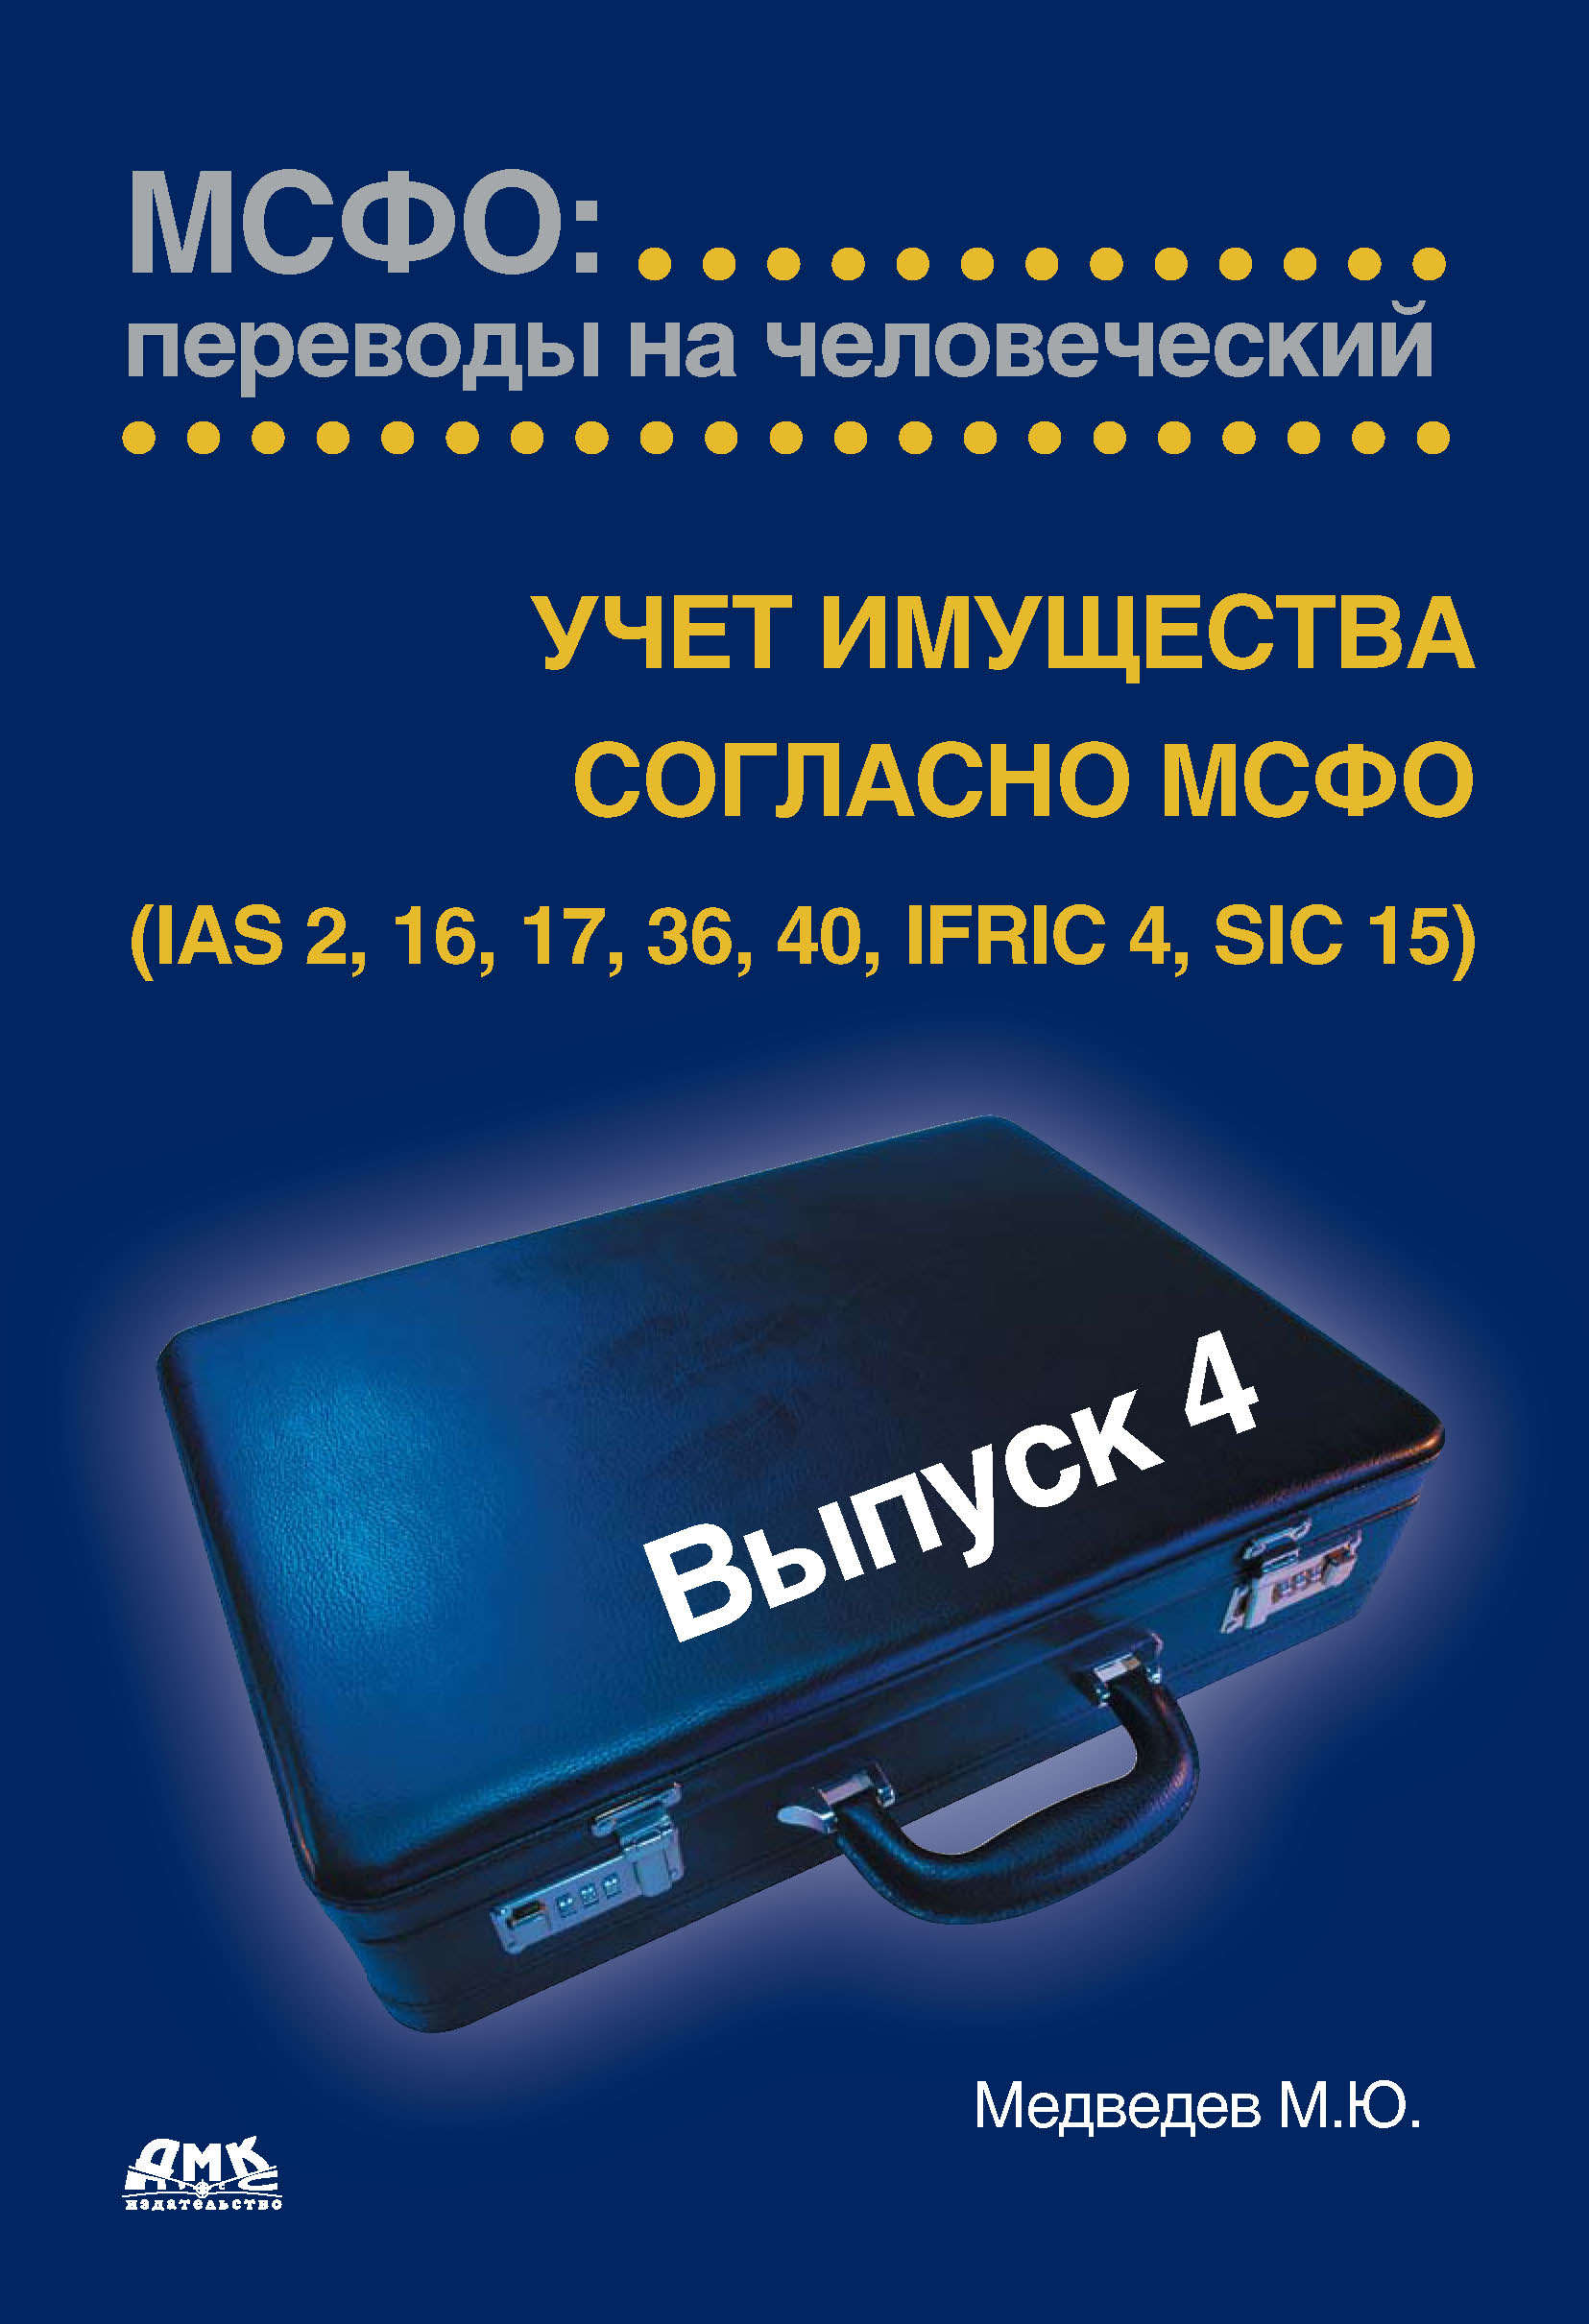 М. Ю. Медведев Учет имущества согласно МСФО (IAS 2, 16, 17, 36, 40, IFRIC 4, SIC 15)